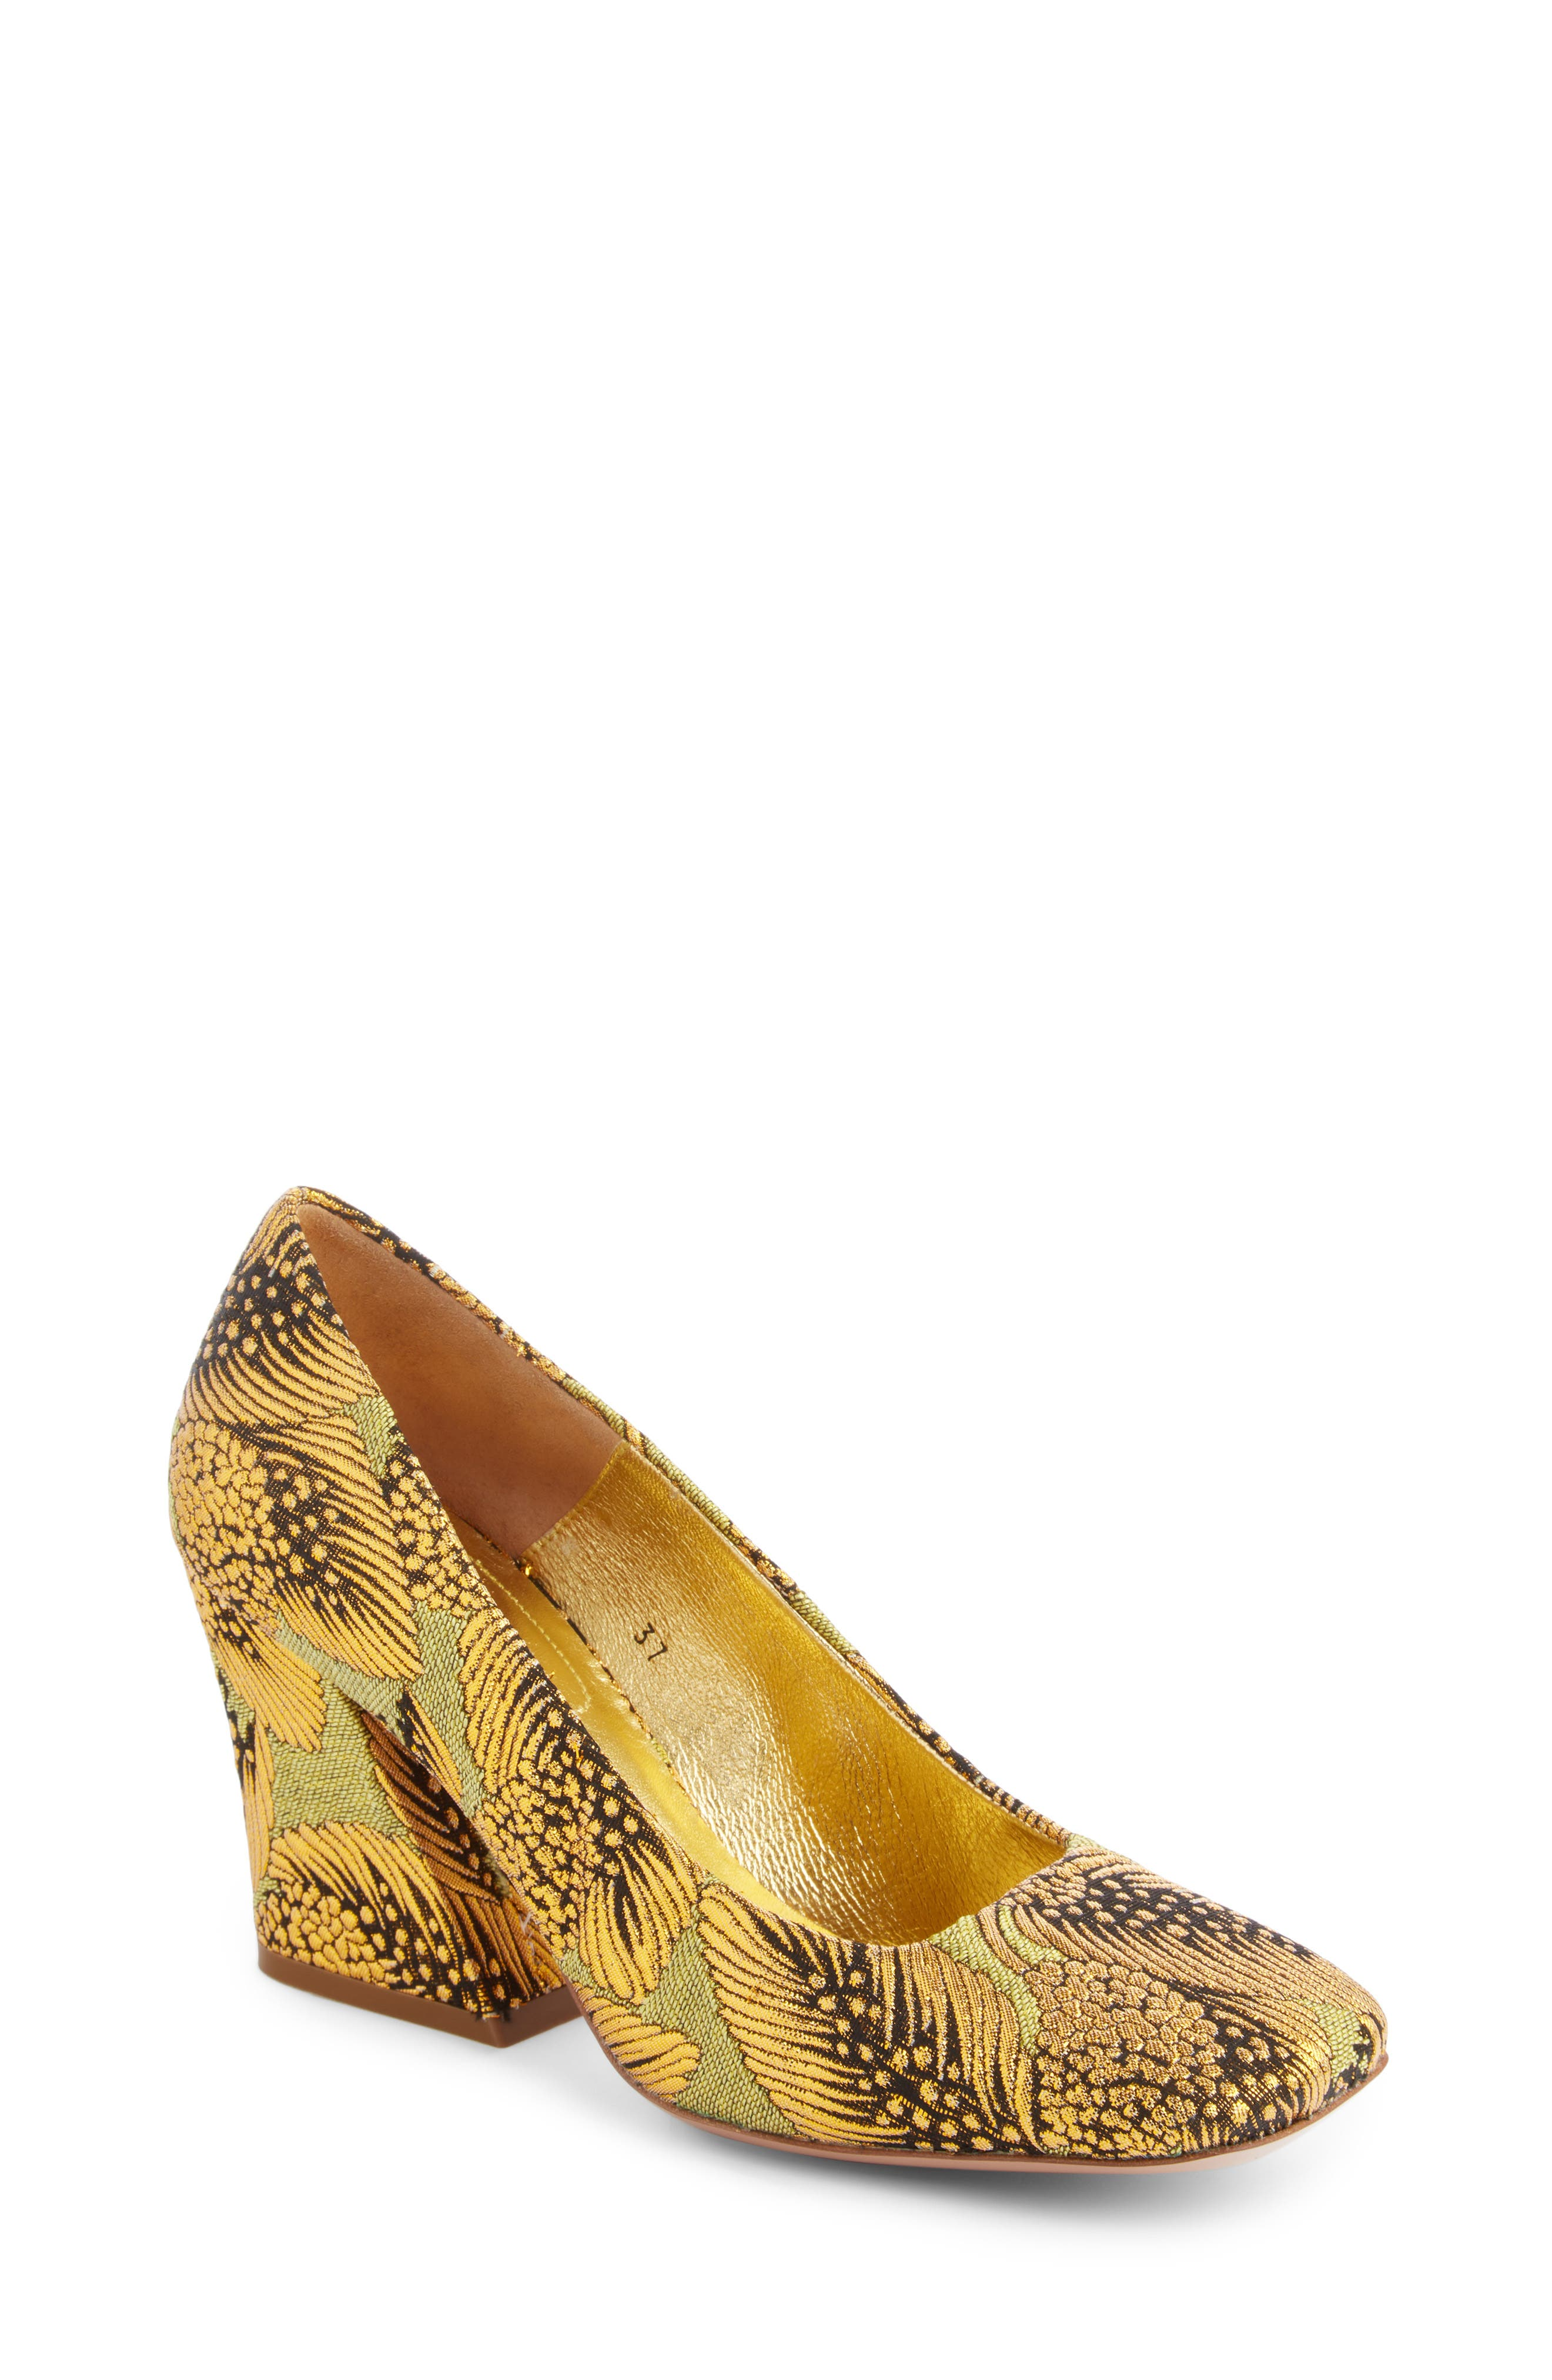 Main Image - Dries Van Noten Leaf Print Angle Heel Pump (Women)